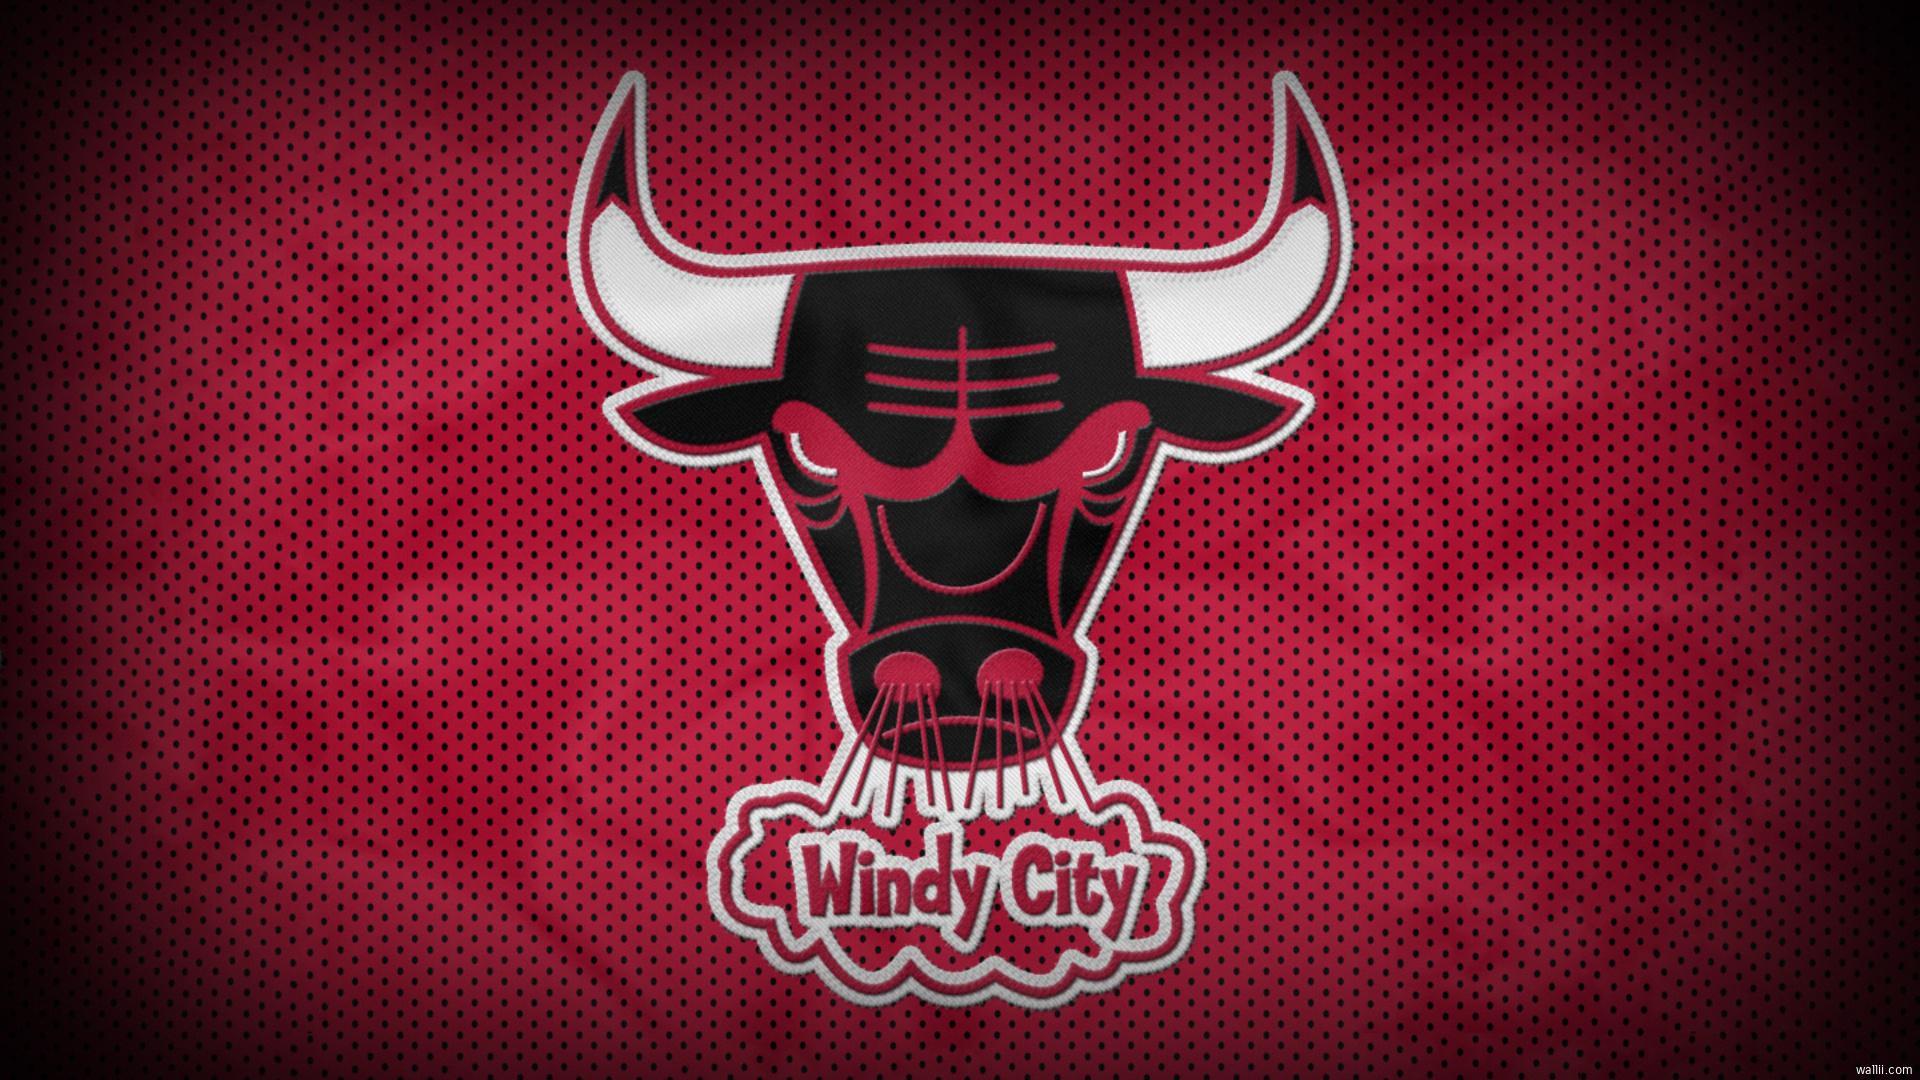 chicago-bulls-wallpaper-hd-1.jpg